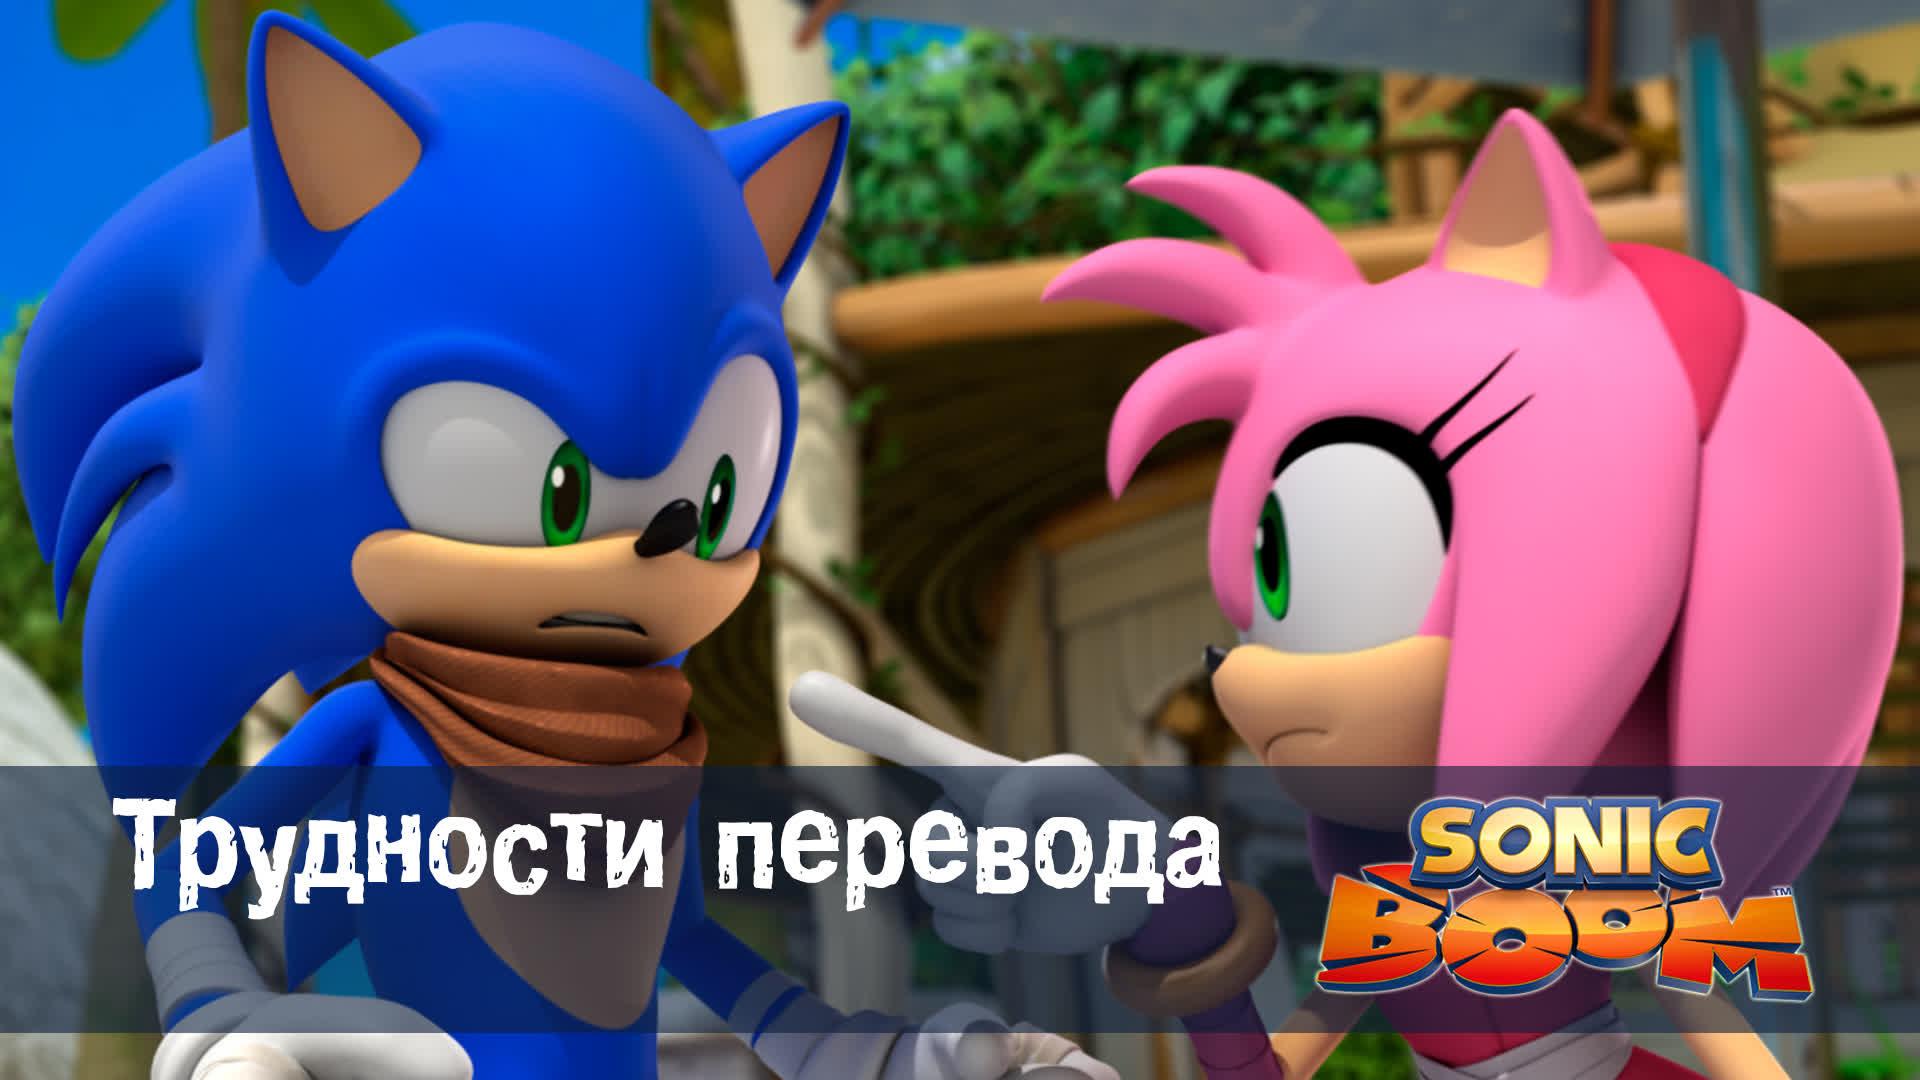 Соник Бум - Серия 3